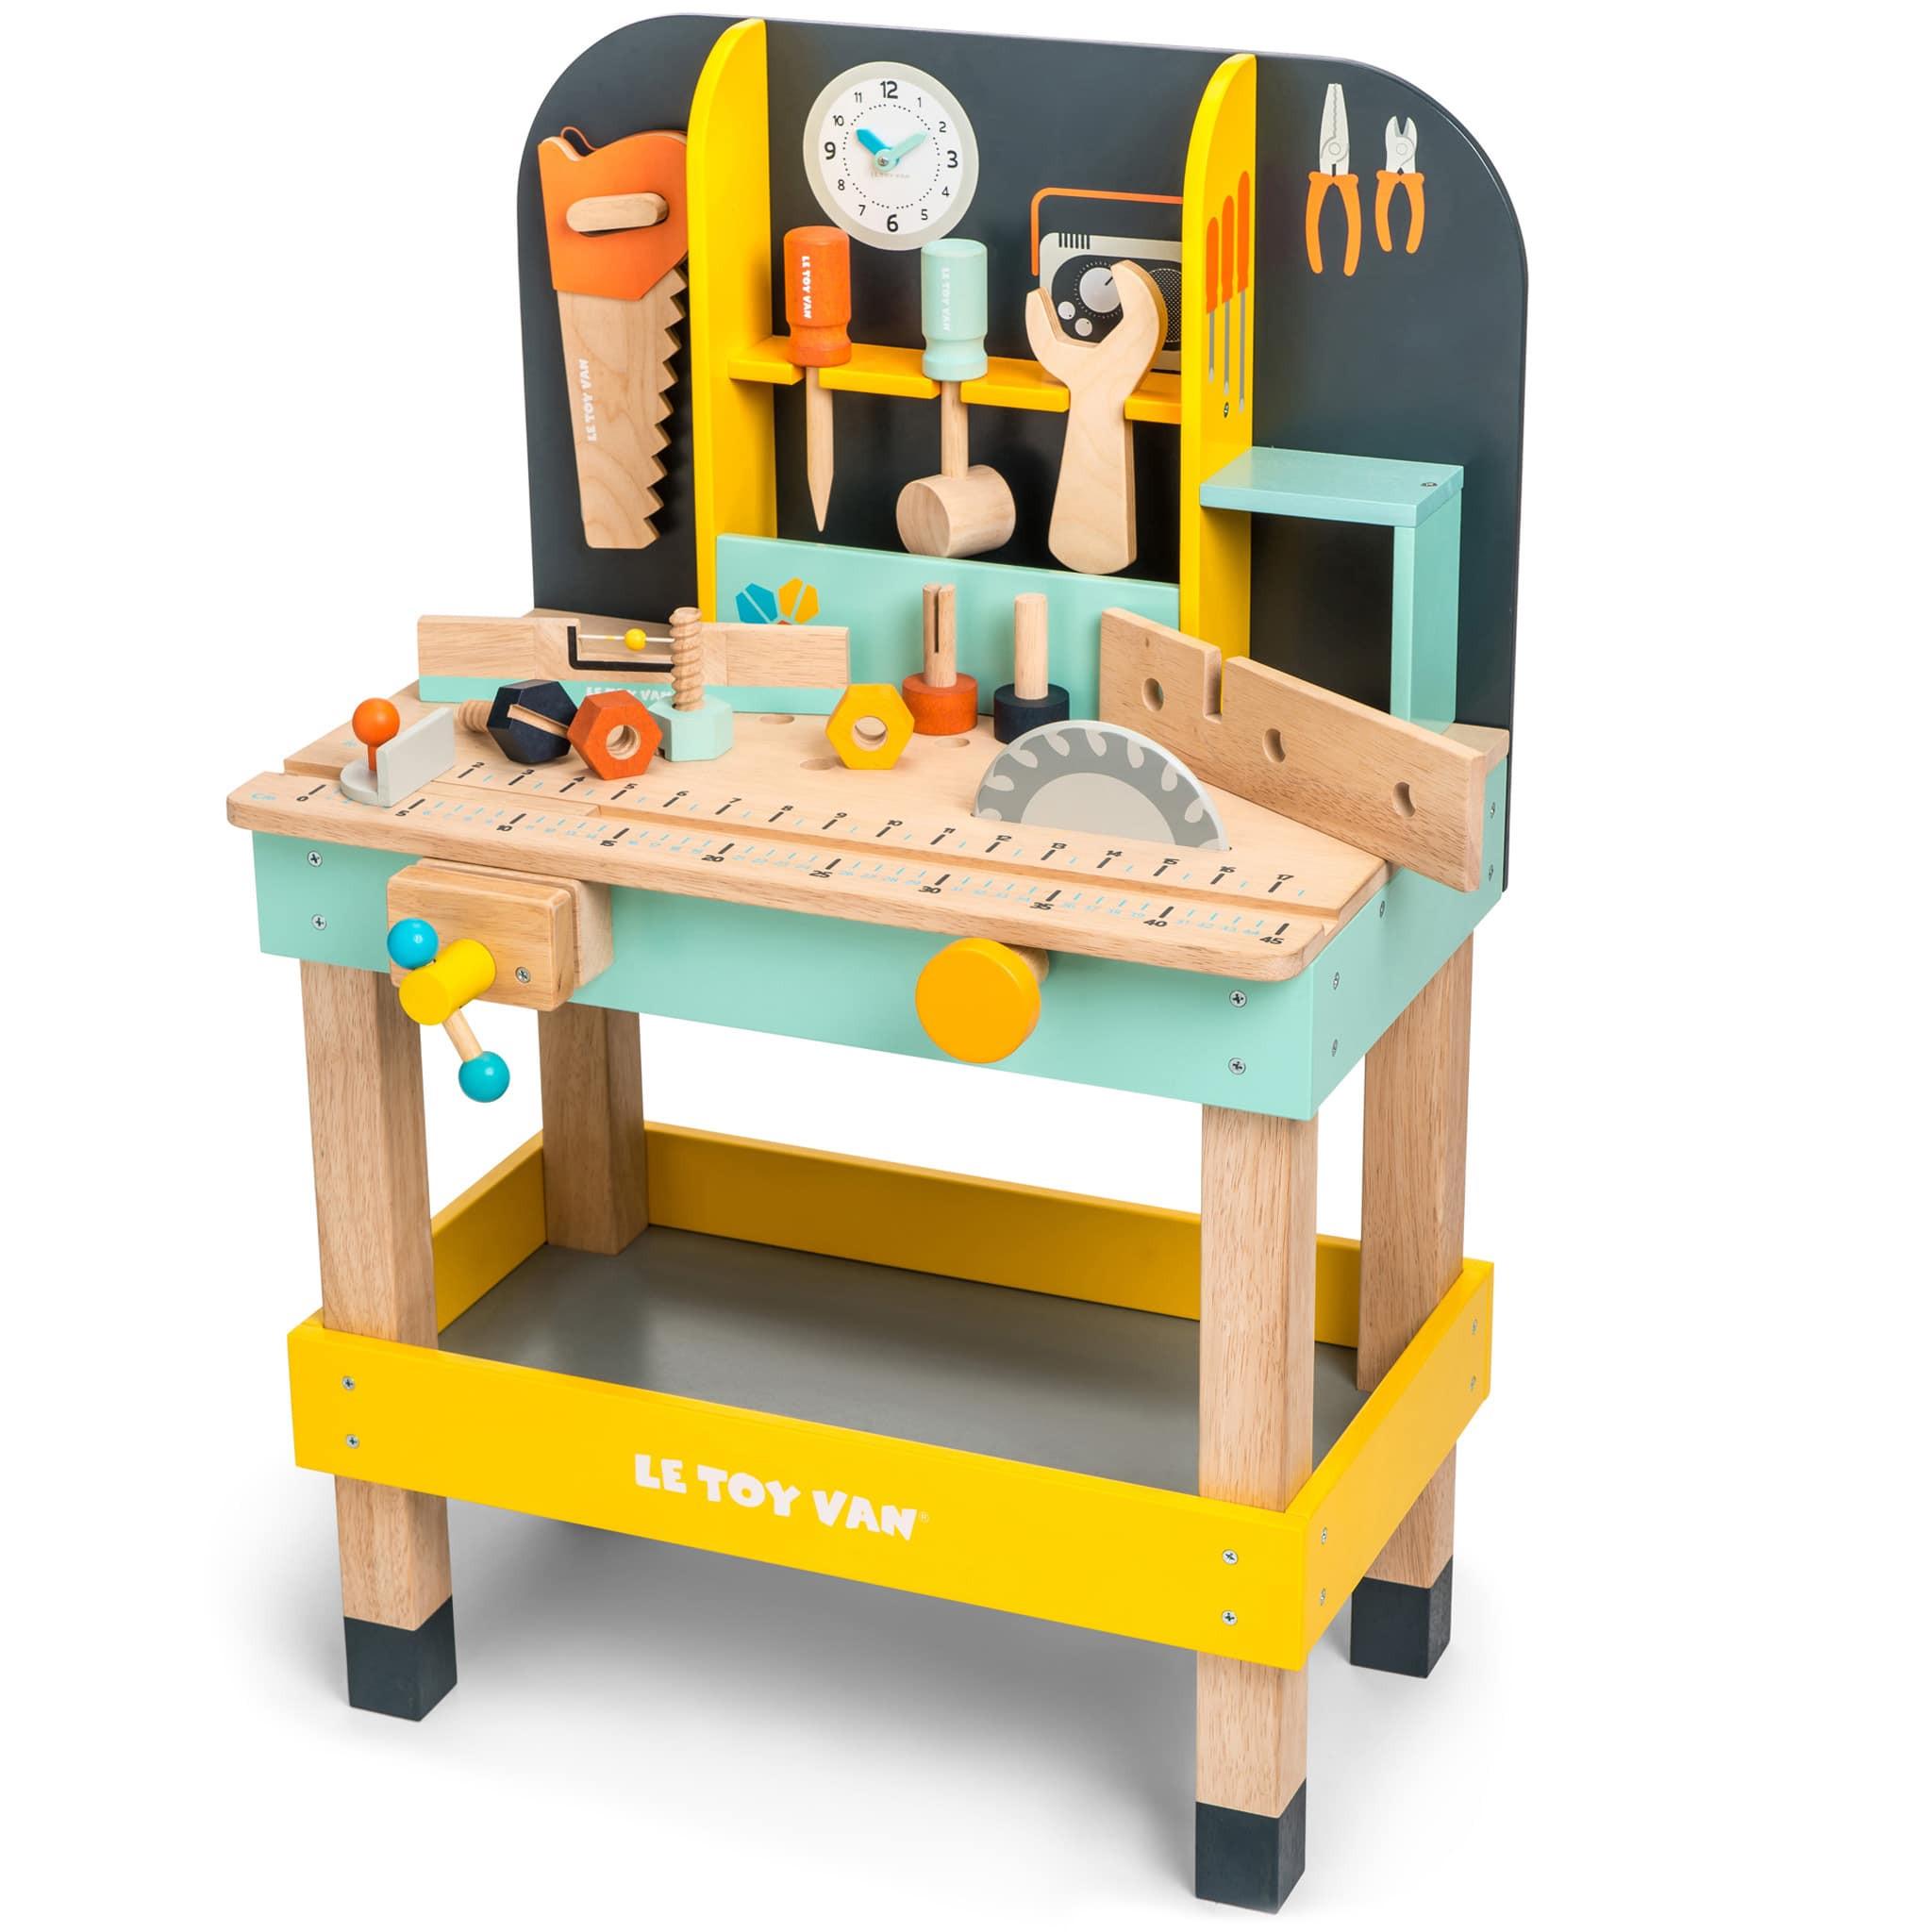 Le Toy Van L'établi de bricolage